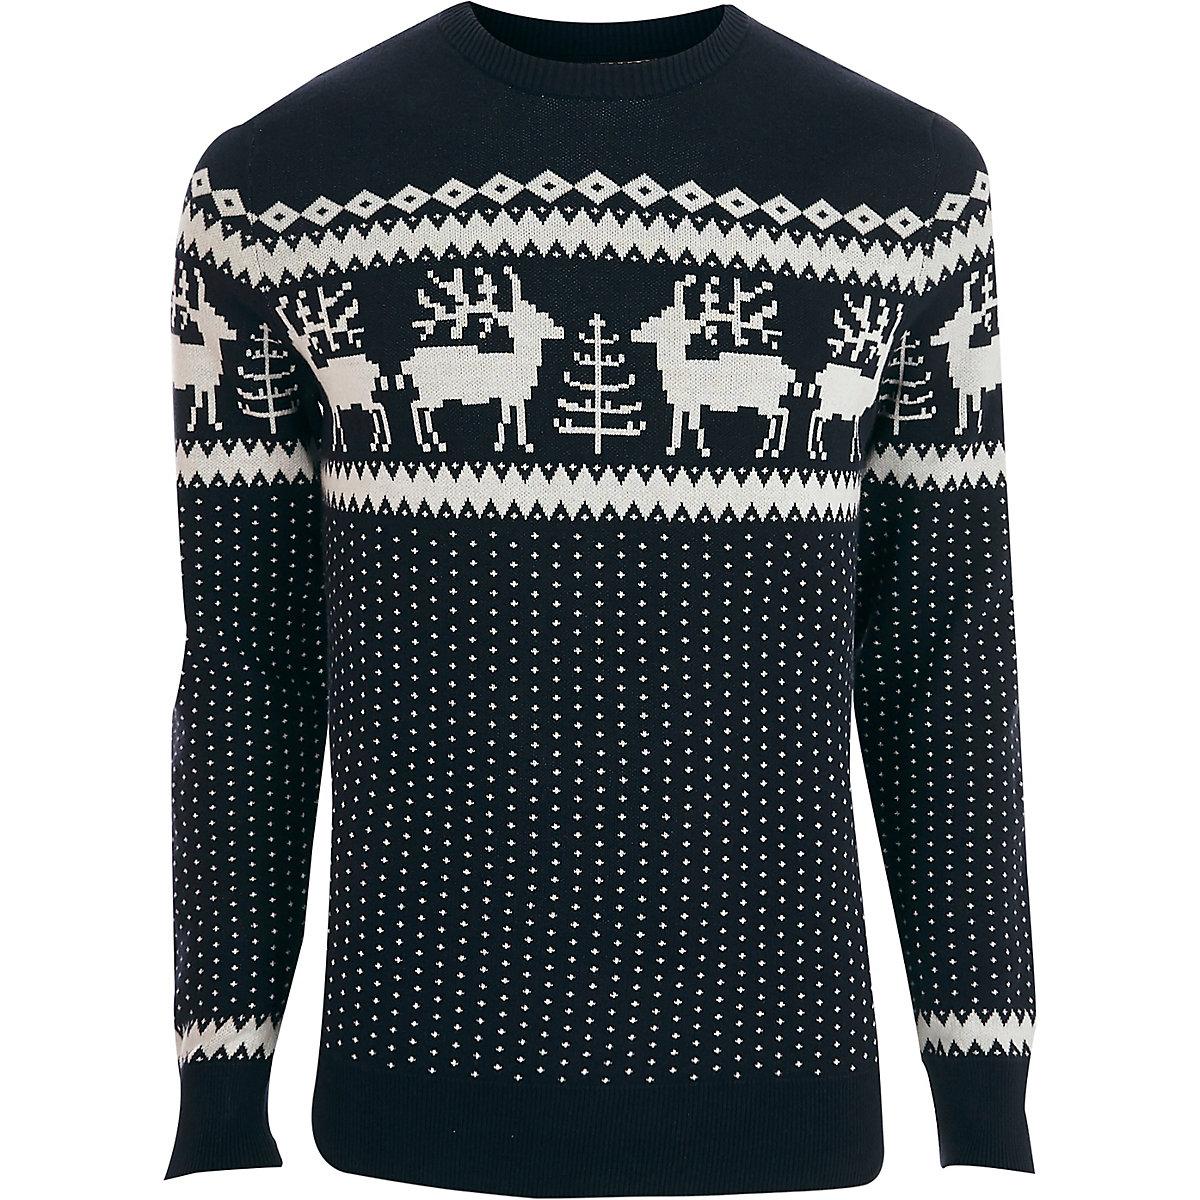 Jack & Jones Premium navy Christmas sweater